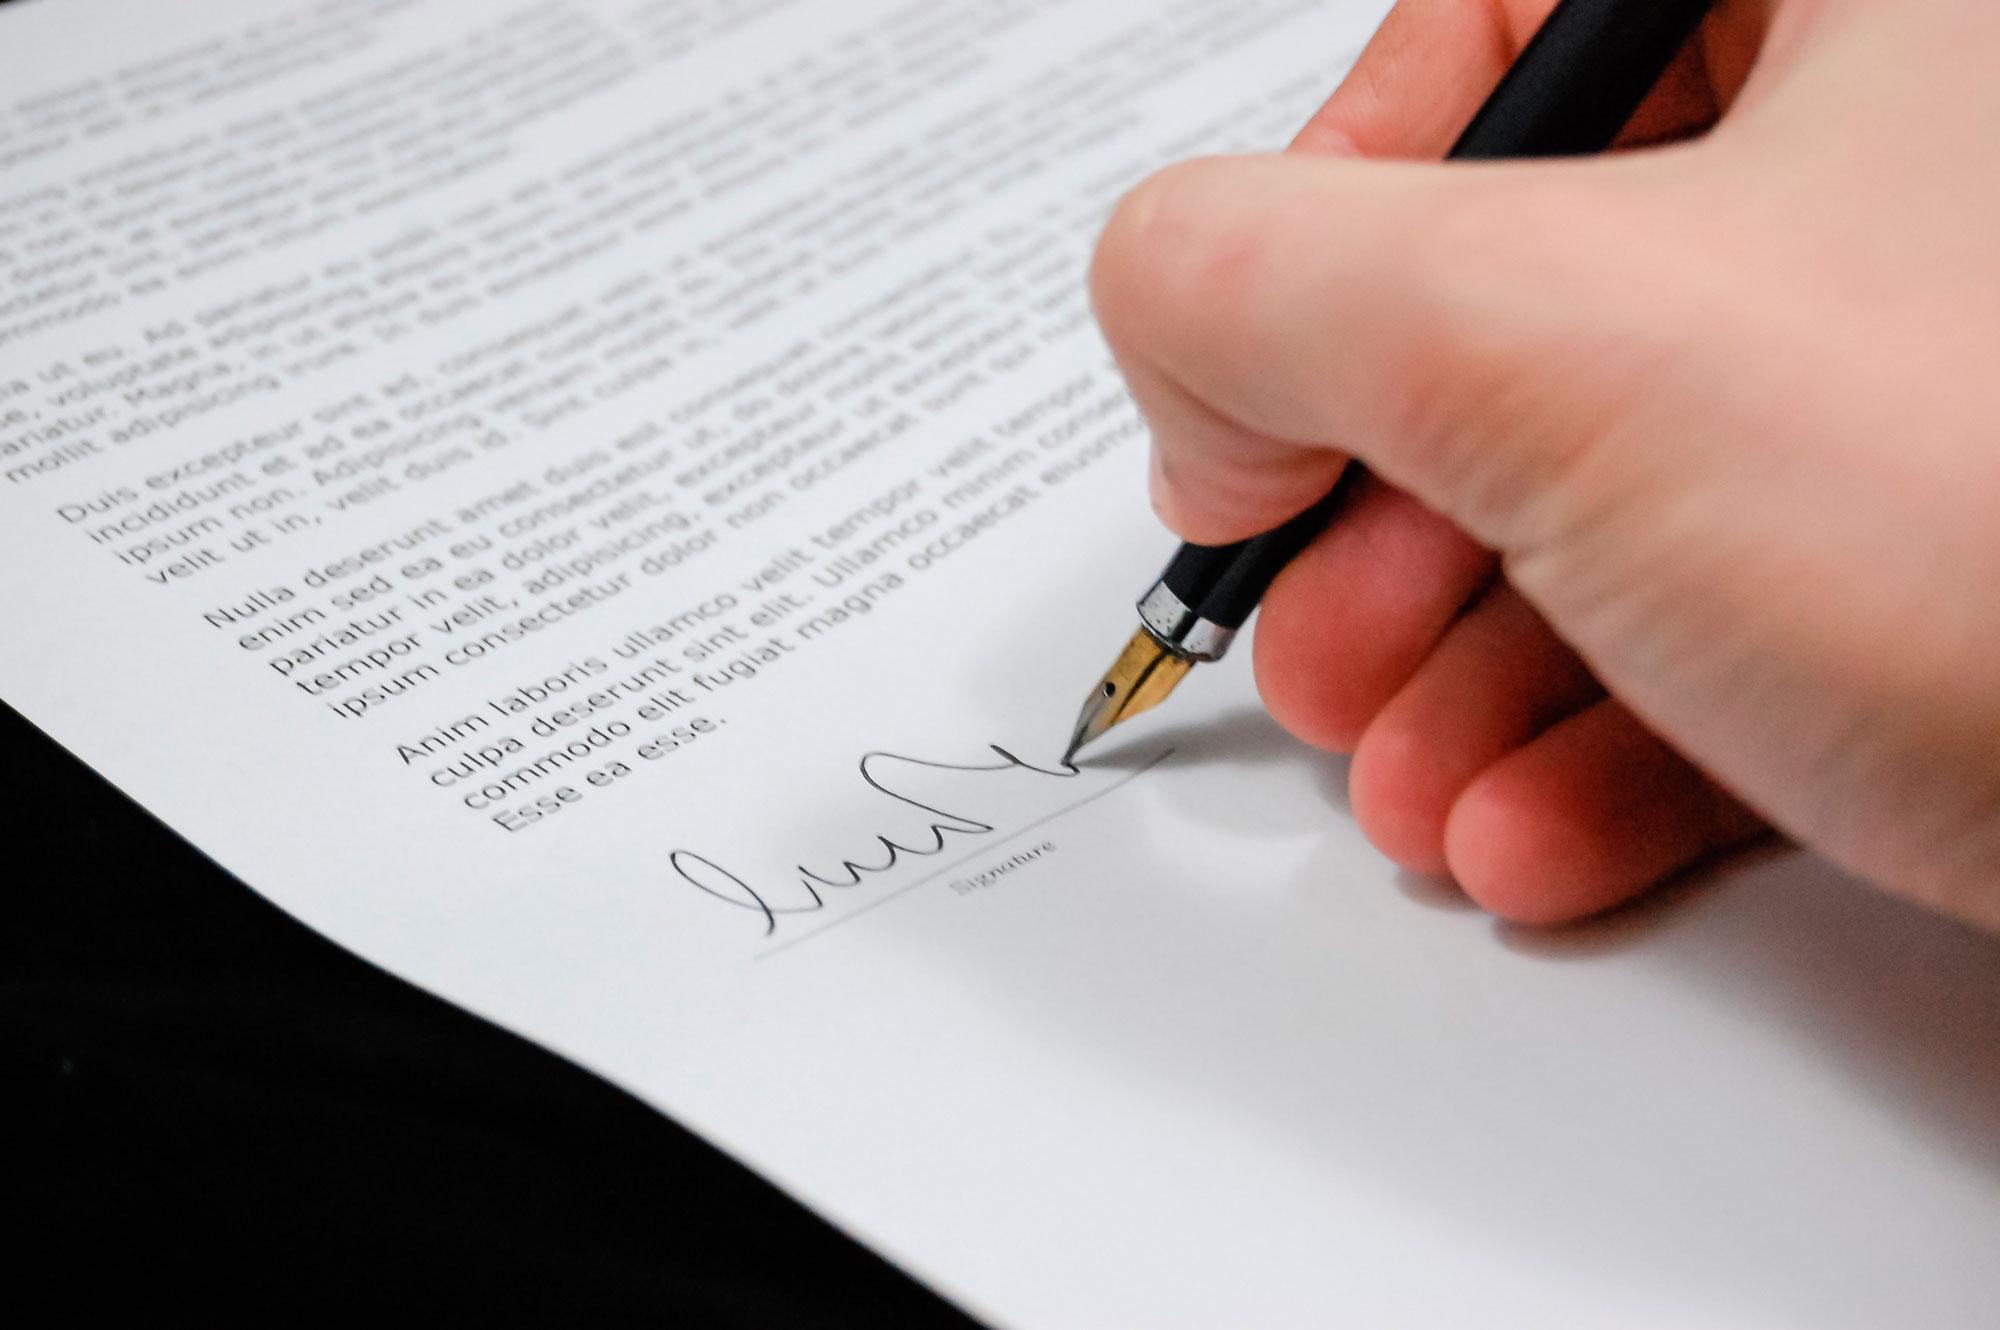 Persona firmando carta corporativa